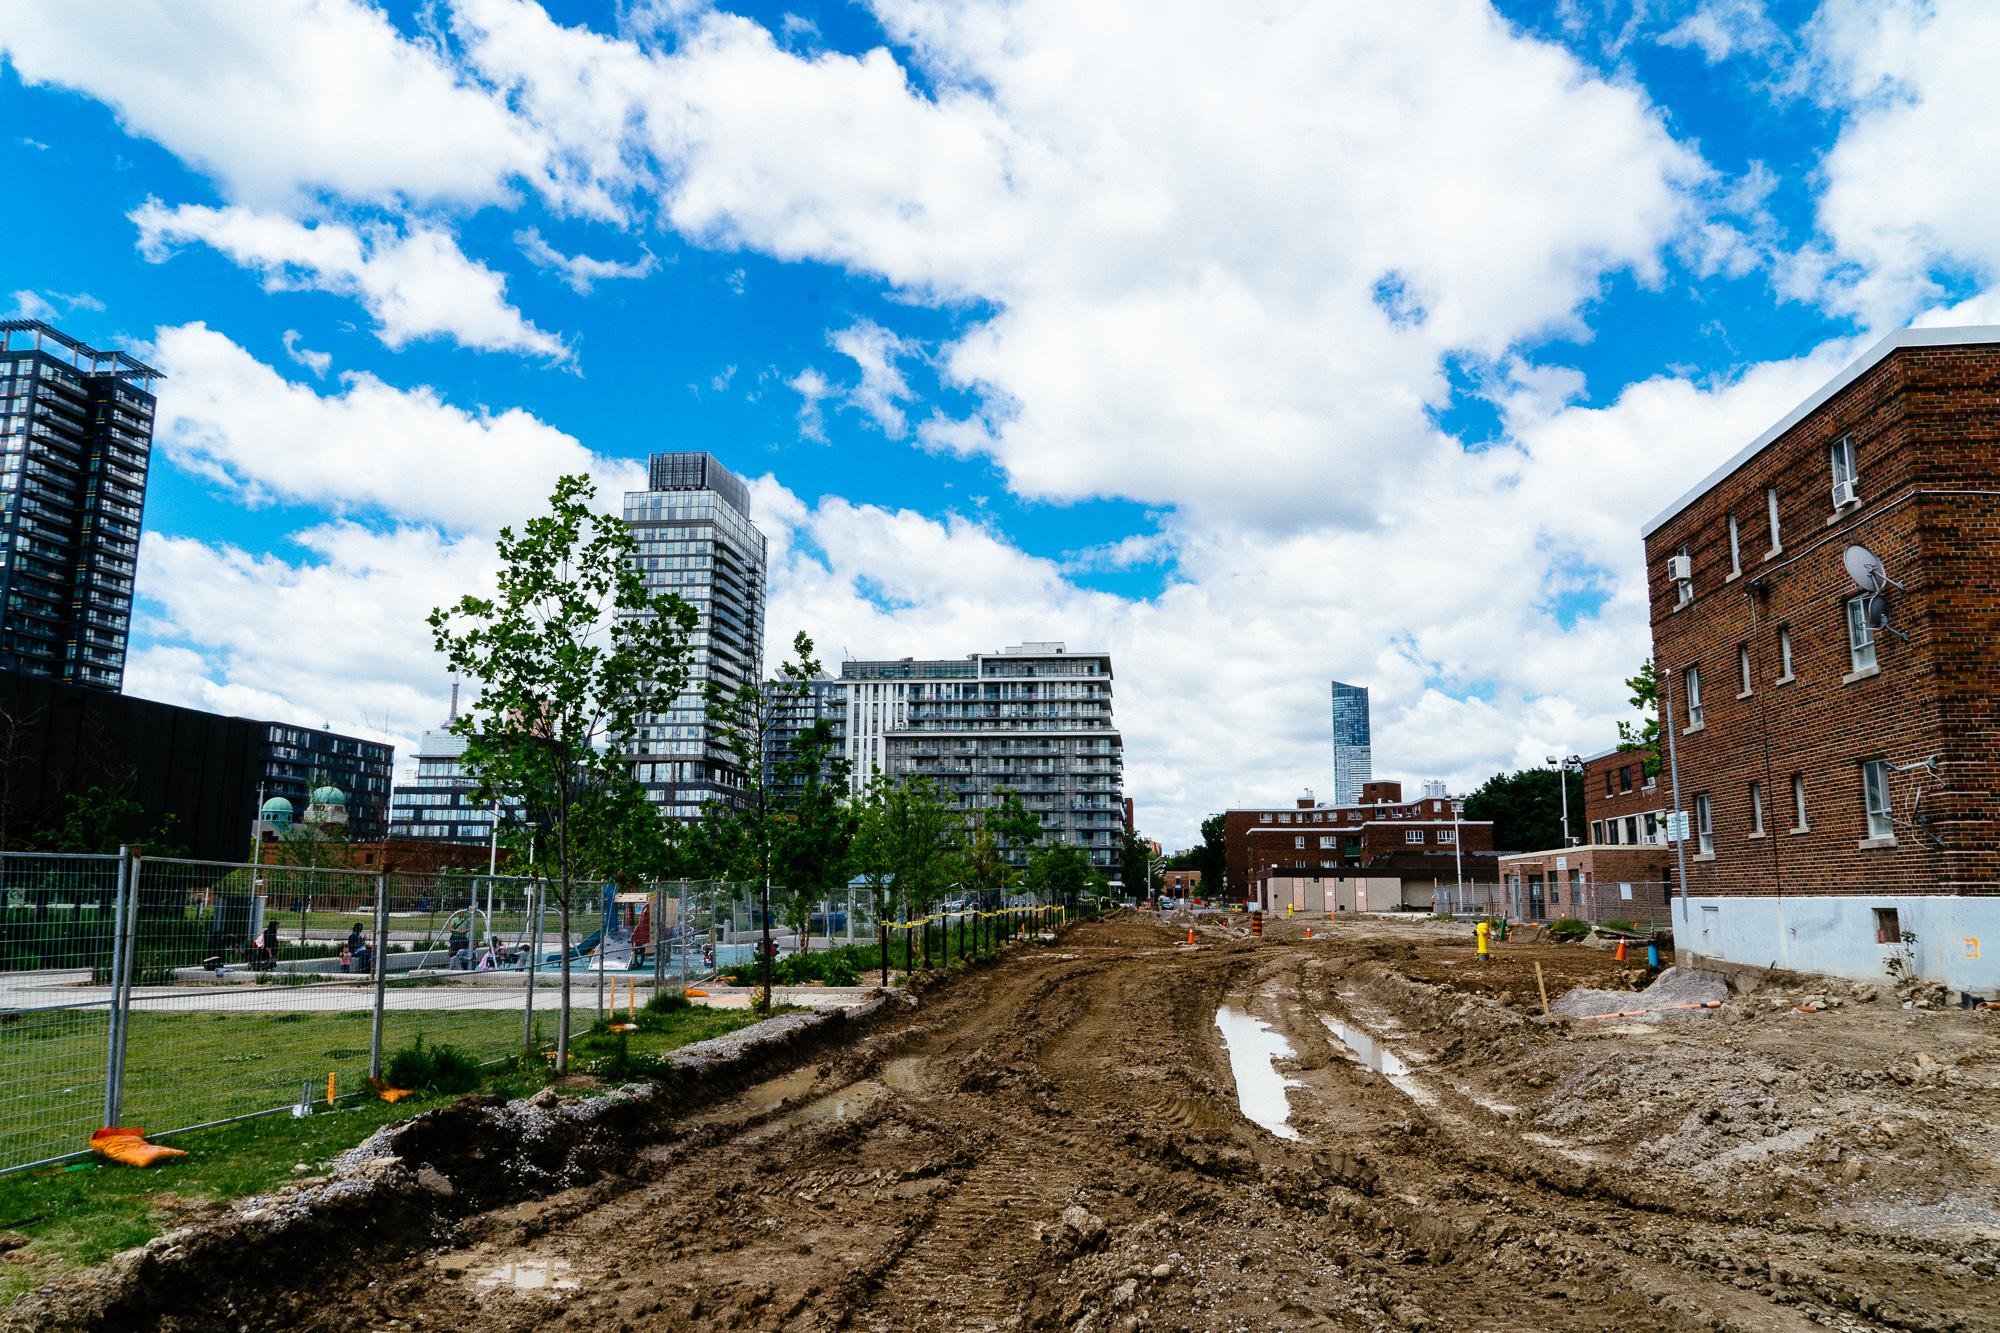 The dividing line of development in Regent Park